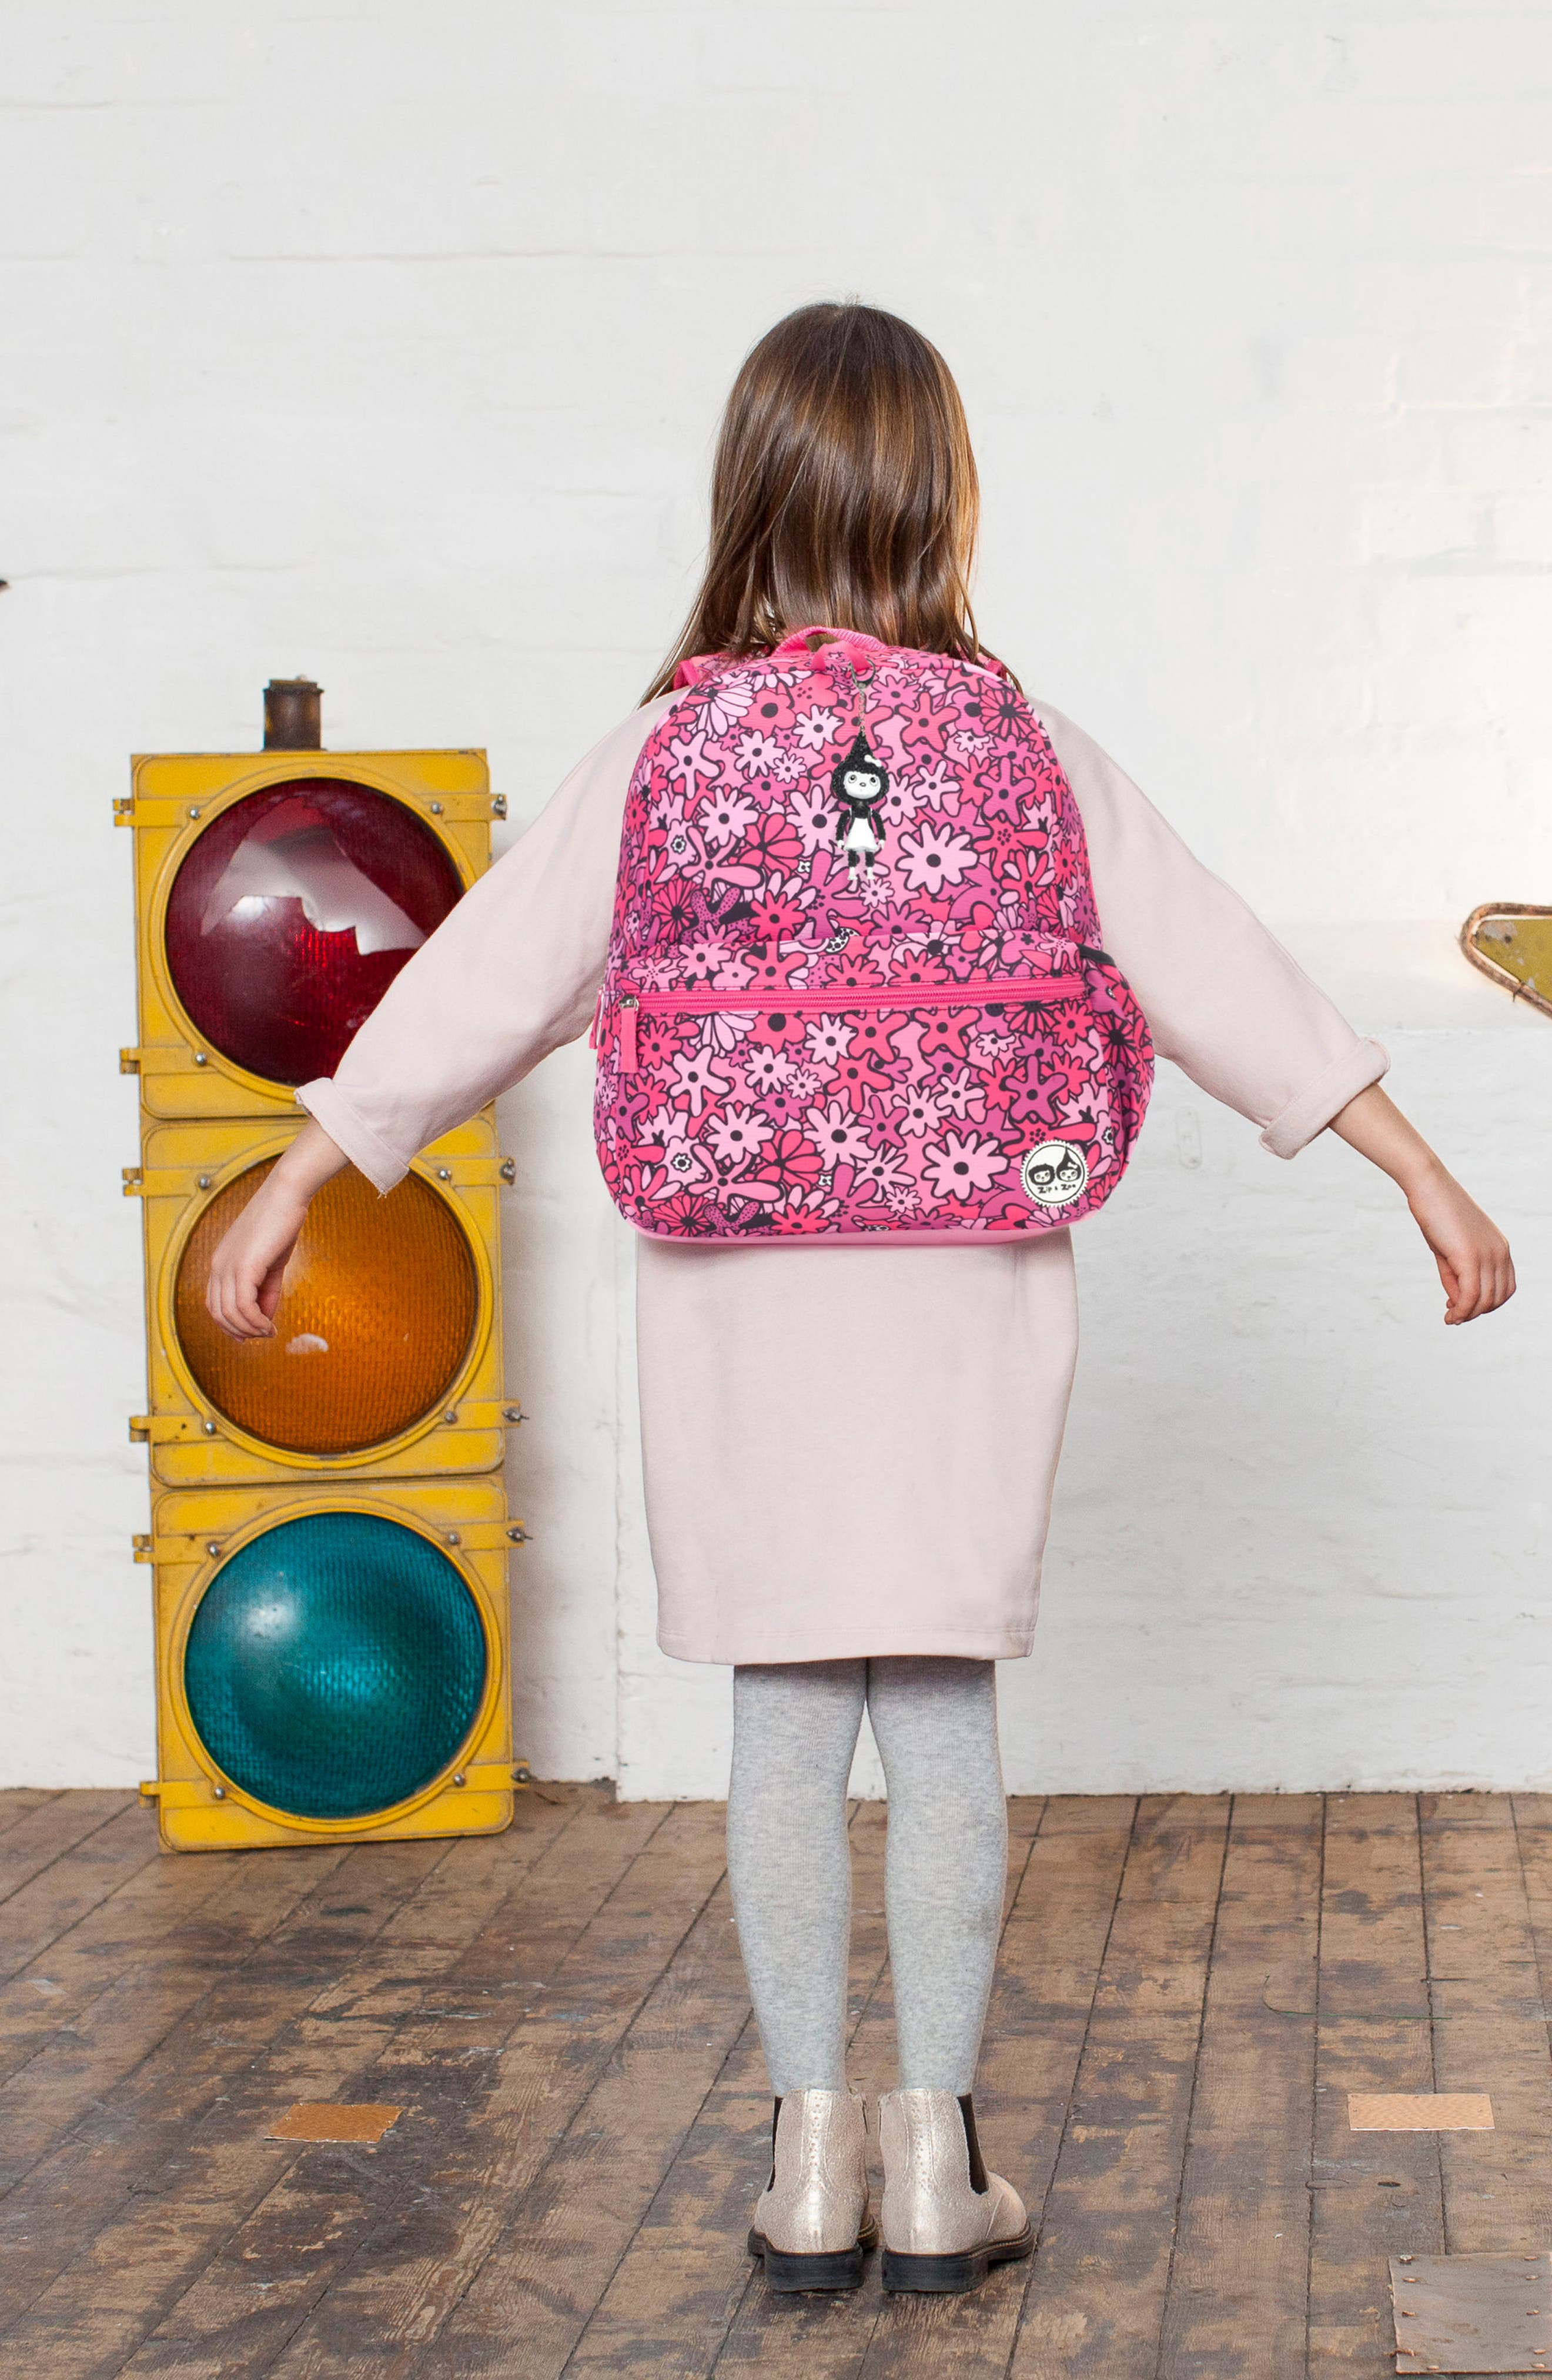 Zip & Zoe Floral Junior Backpack,                             Alternate thumbnail 10, color,                             FLORAL PINK